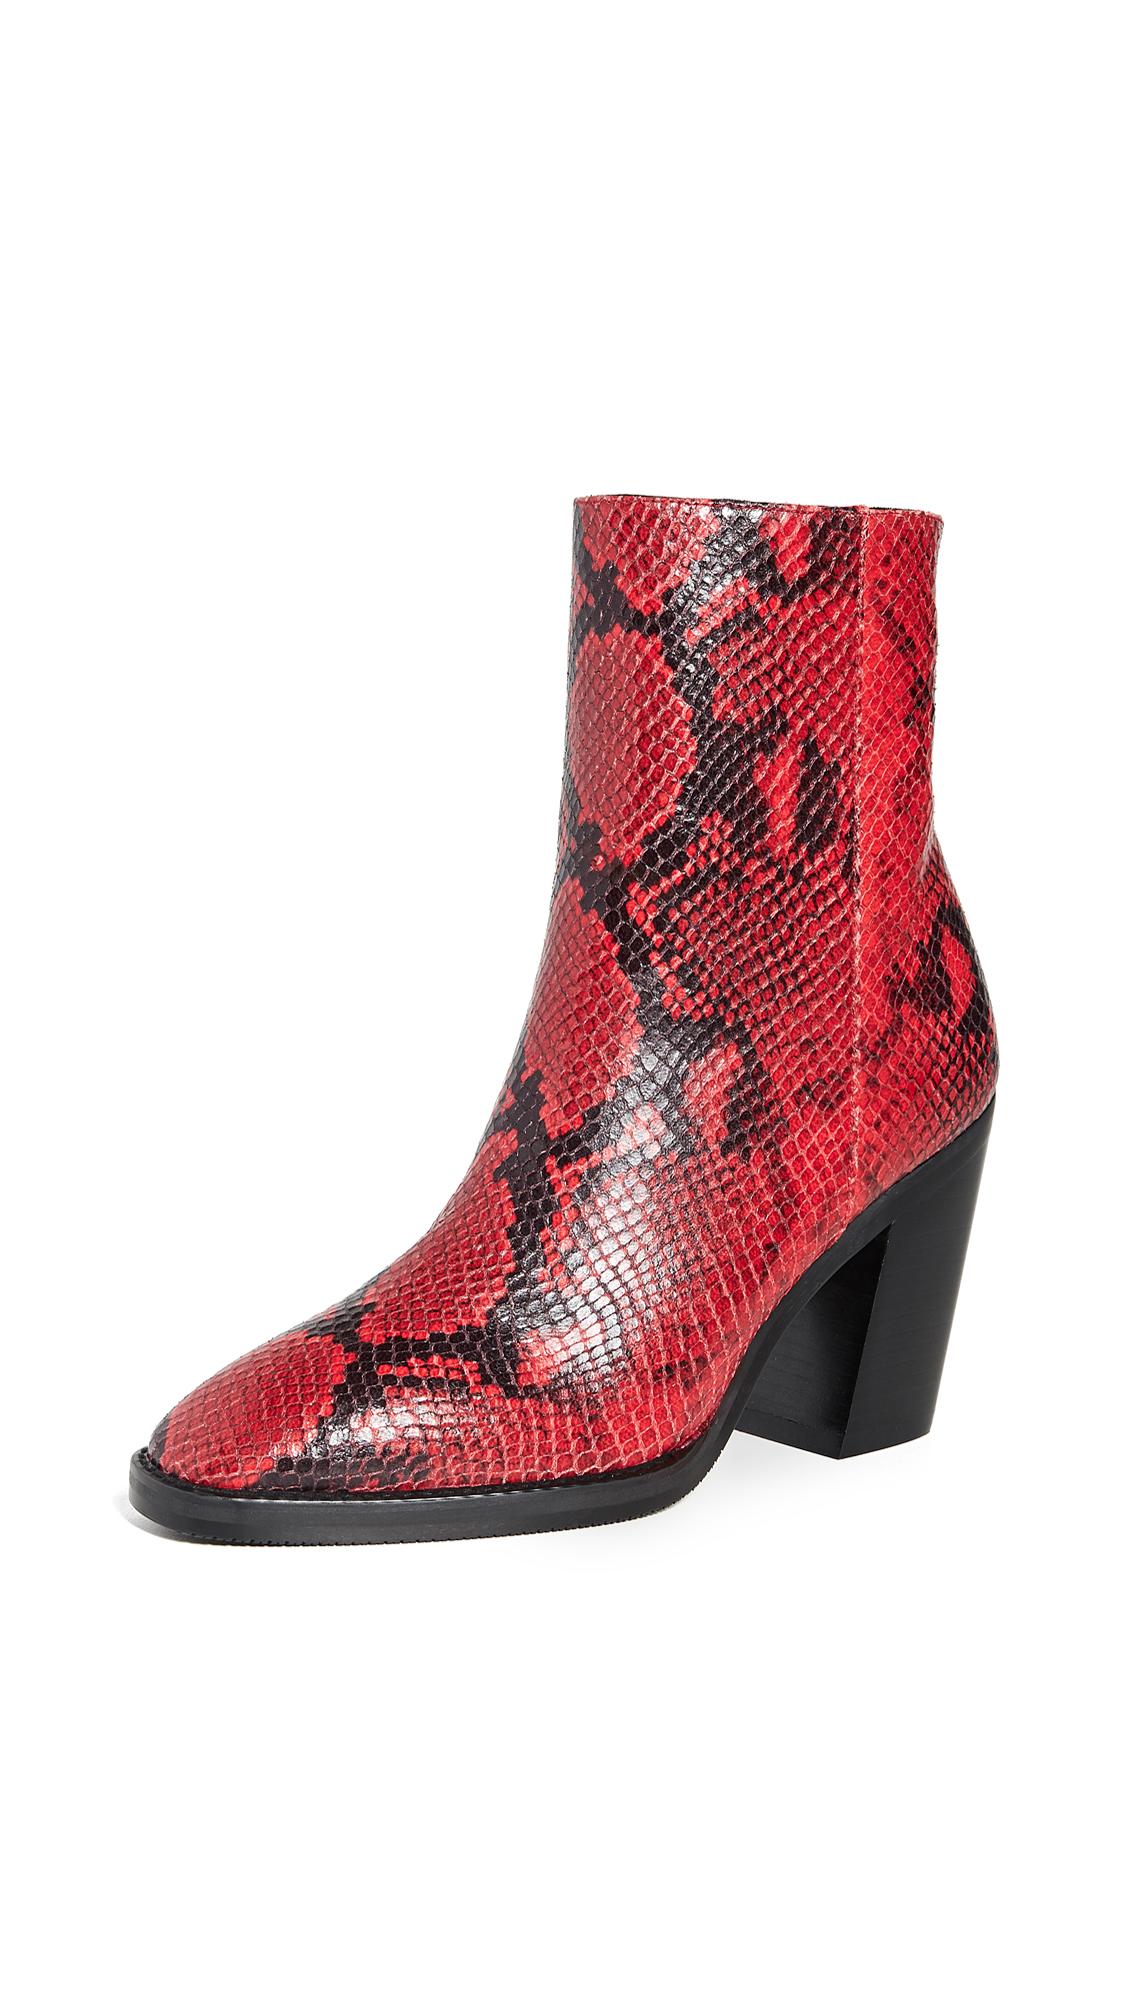 Stuart Weitzman Wynter Boots - Follow Me Red